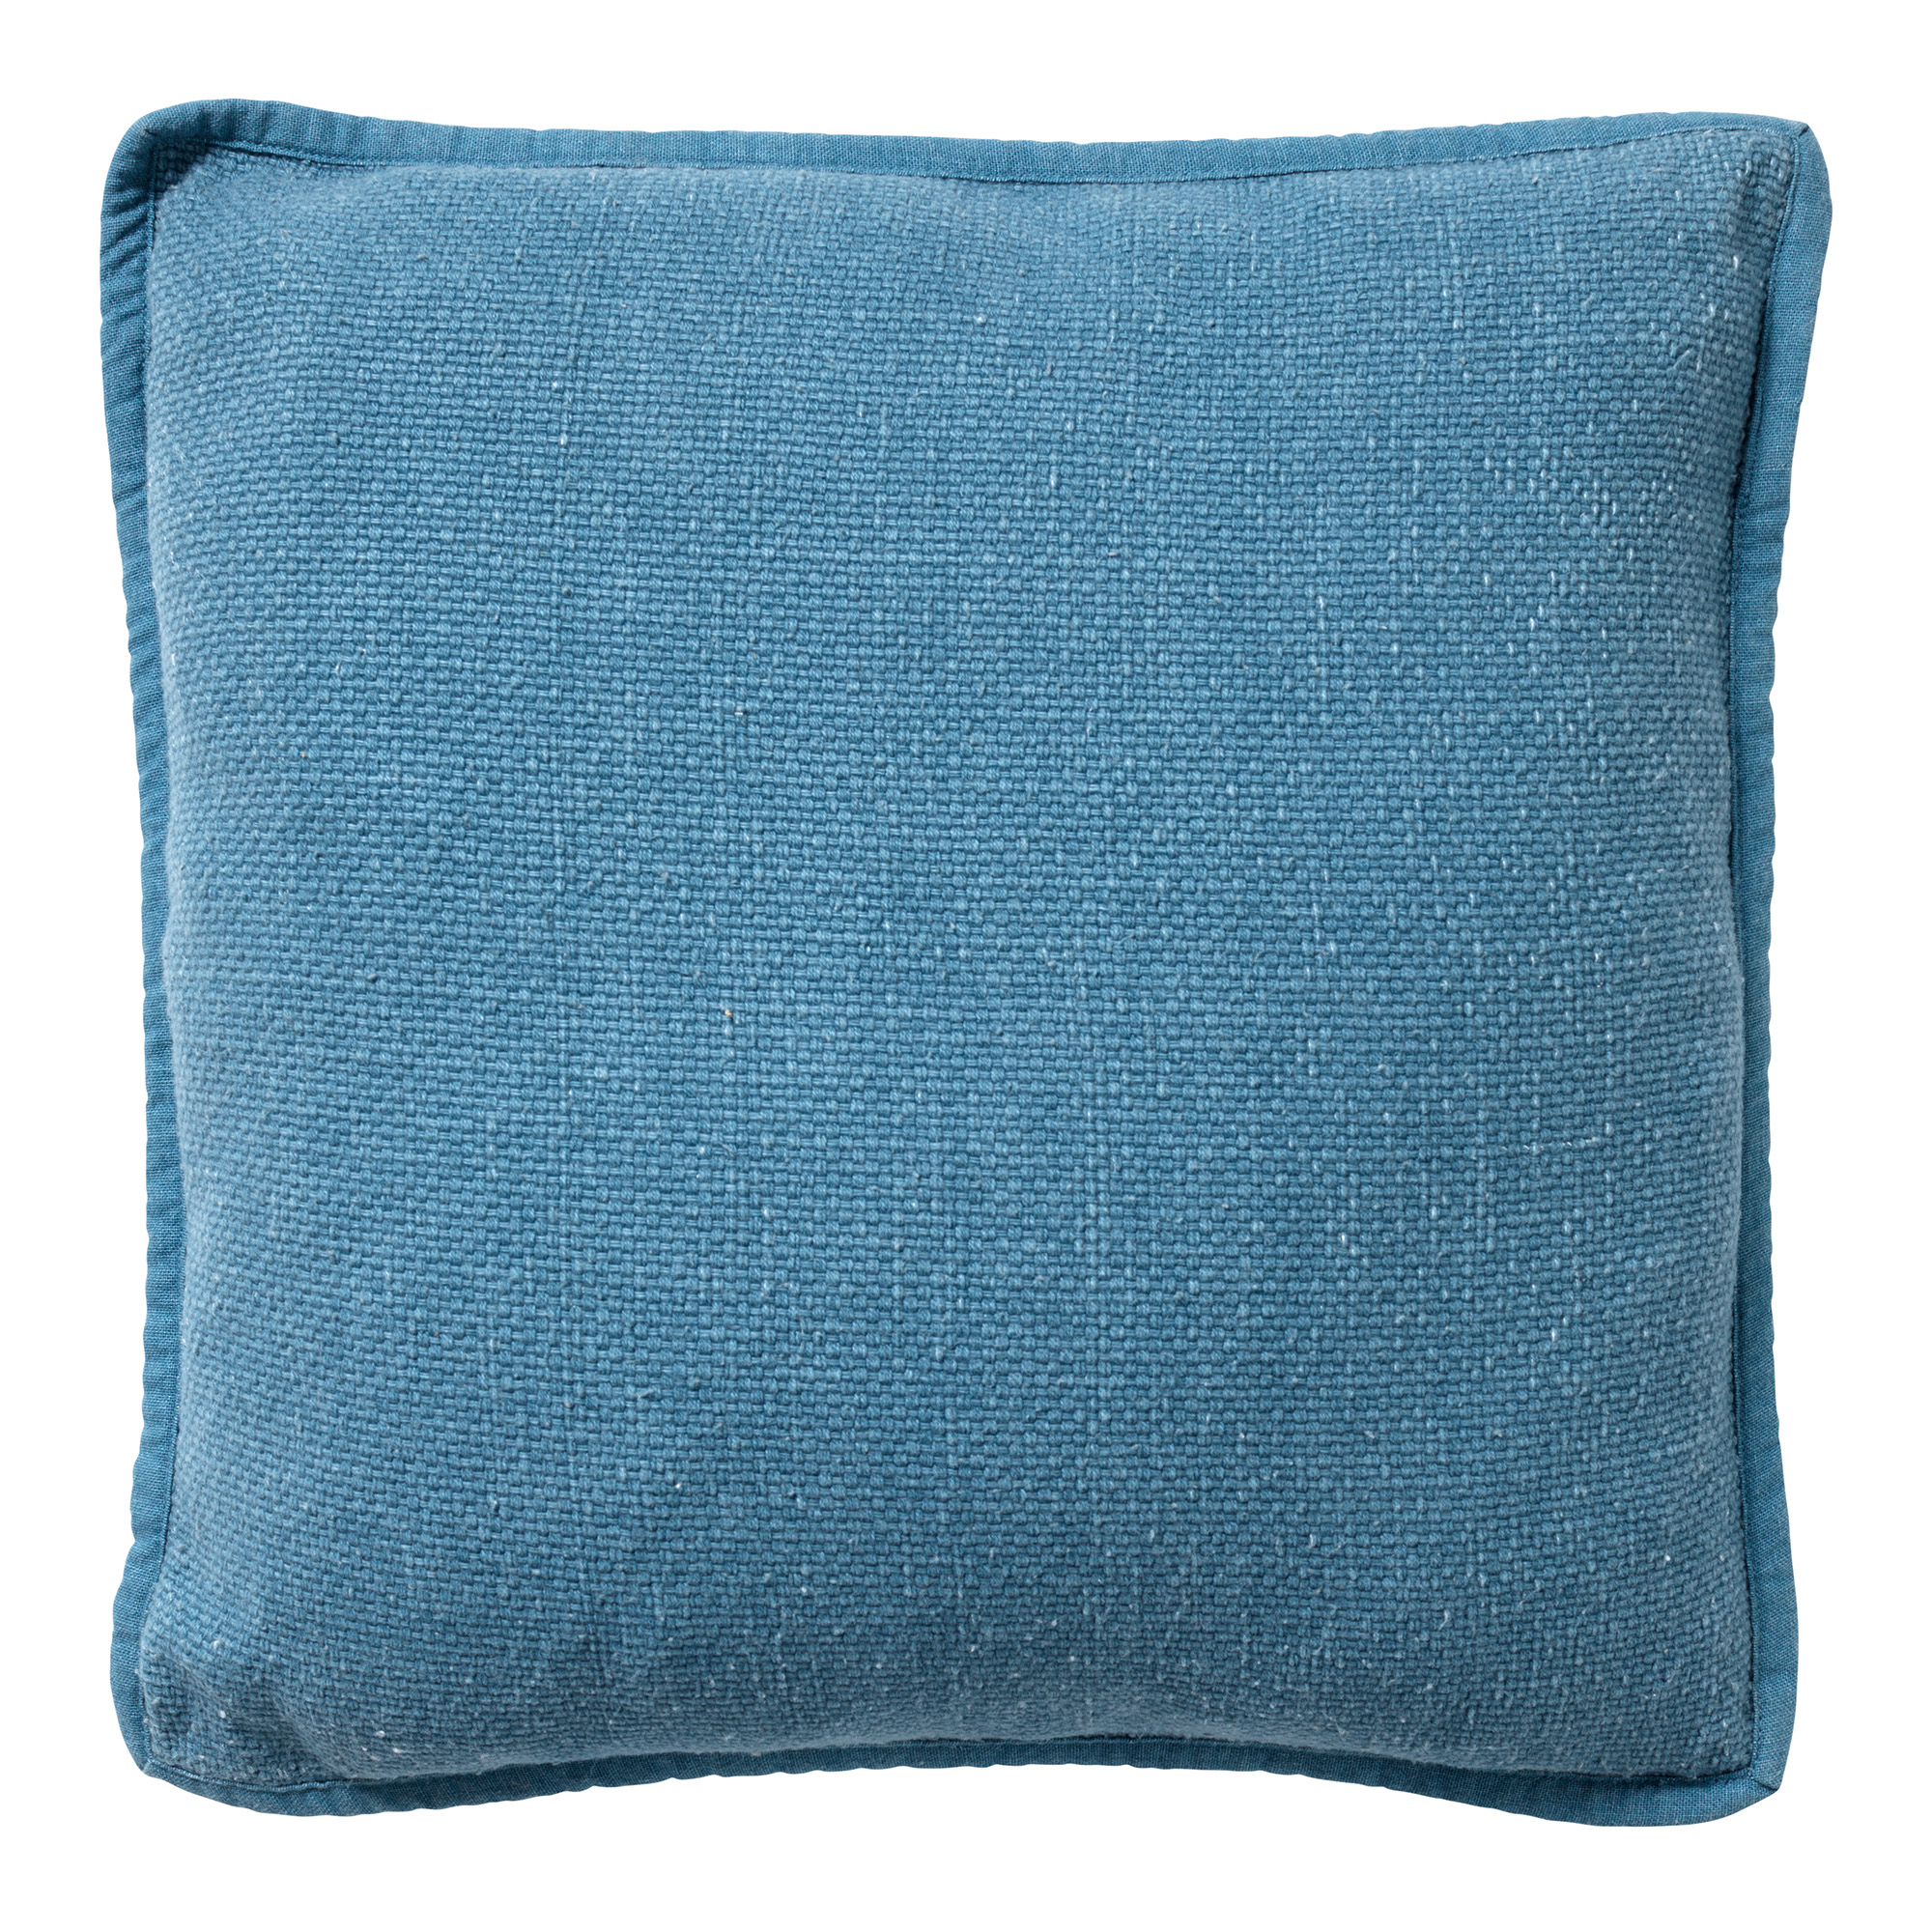 BOWIE - Sierkussen van katoen Provincial Blue 45x45 cm